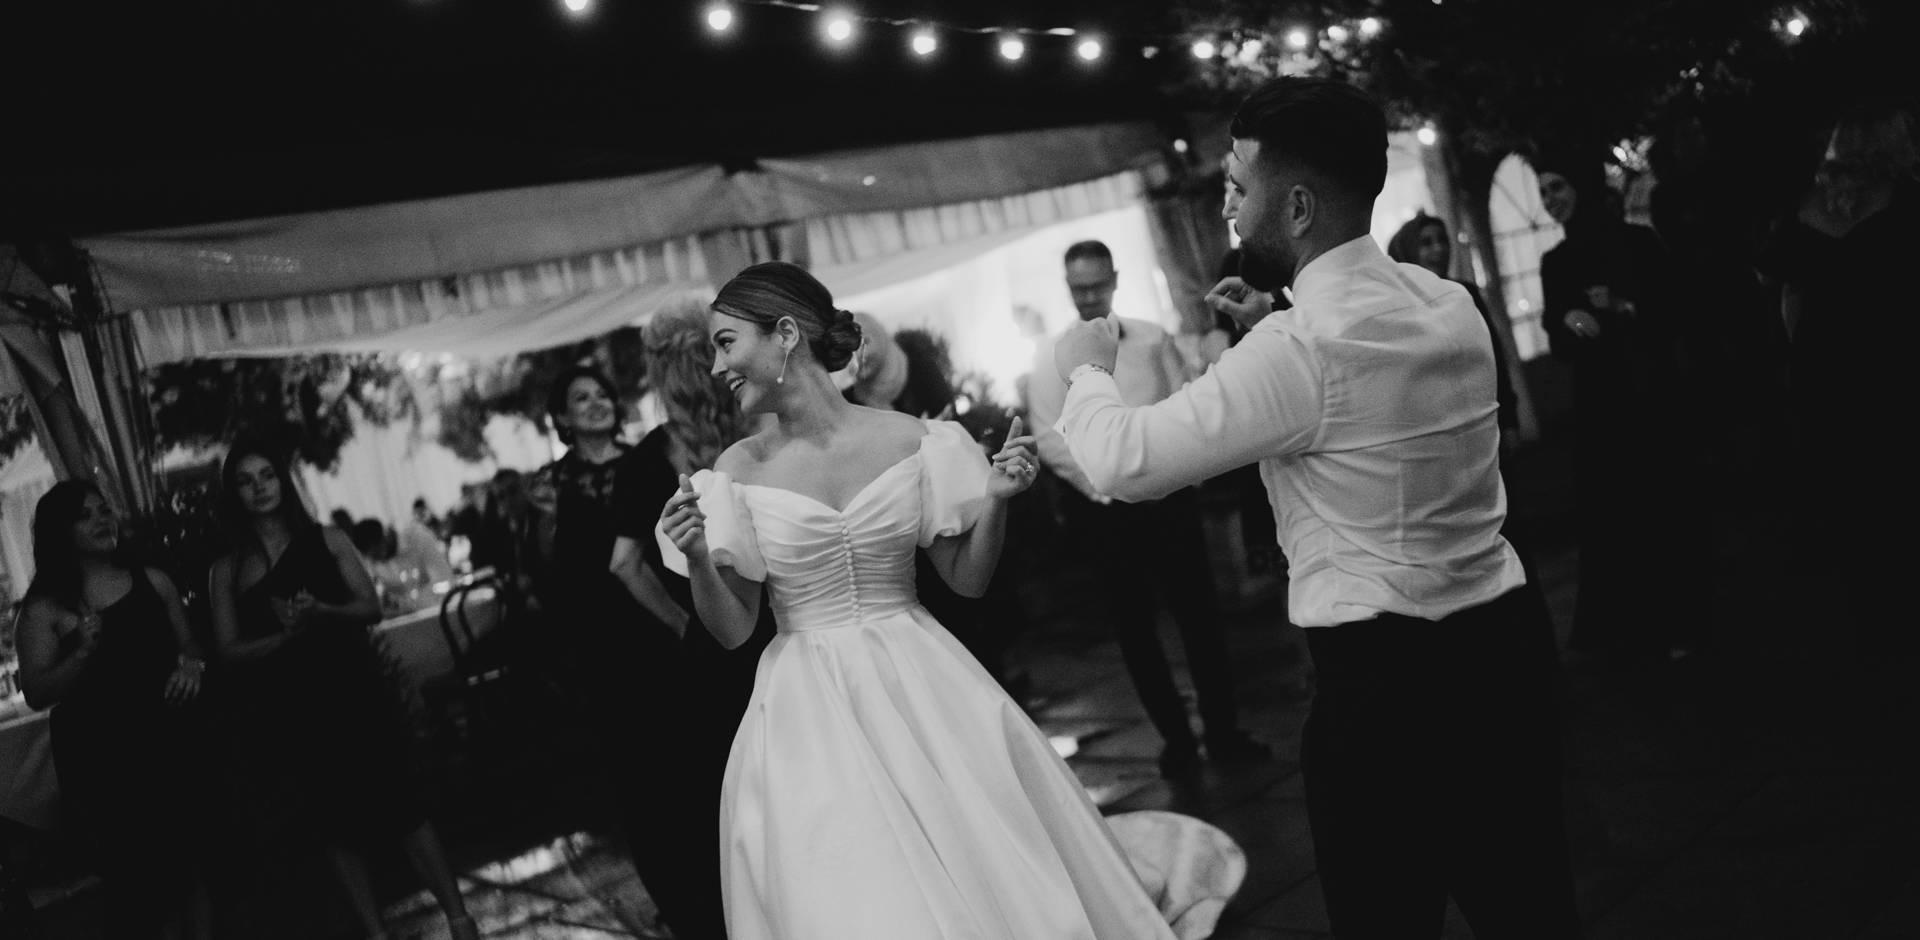 Sydney Wedding Photography, Sydney Wedding Photographer, Sydney Wedding Photograghy, Sydney Wedding, Sydney Wedding Videographer, Sydney Wedding Videography, The Salt Studio, Sydney Film Photographer, Sydney Film Wedding Photographer